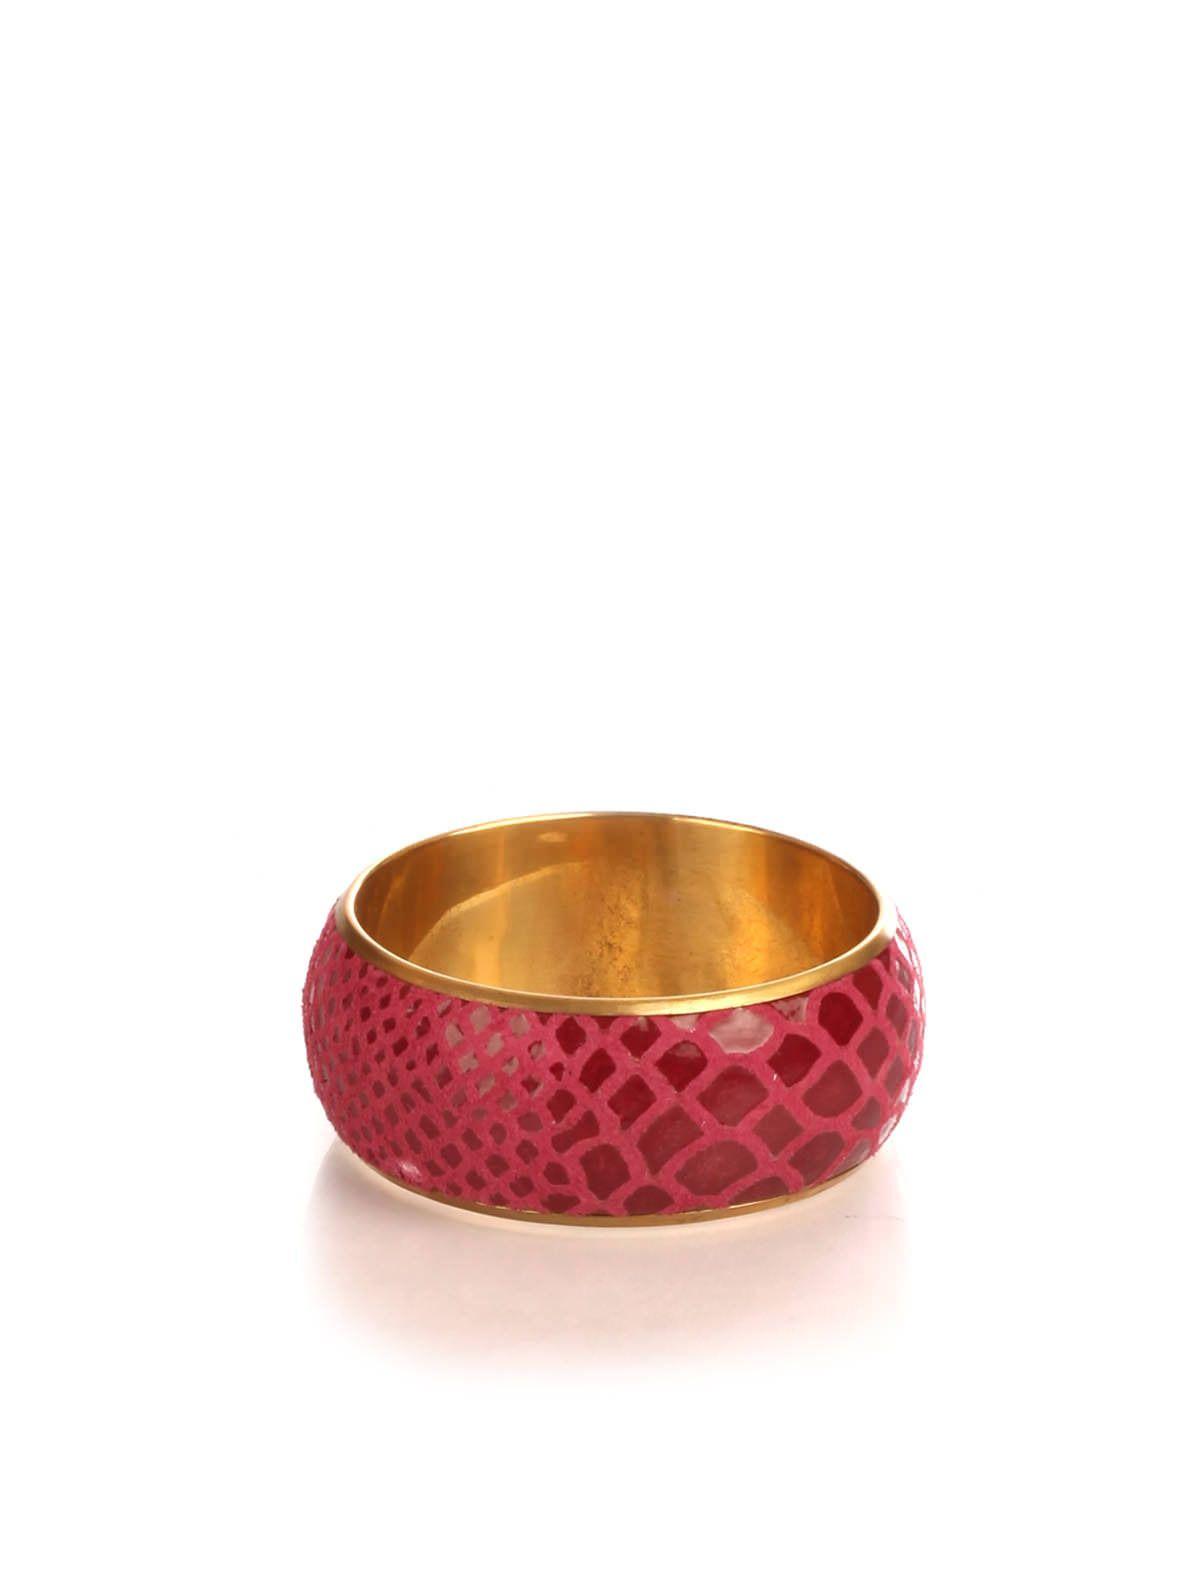 STYLETAG JEWEL BOX / PINK PRINT BANGLE